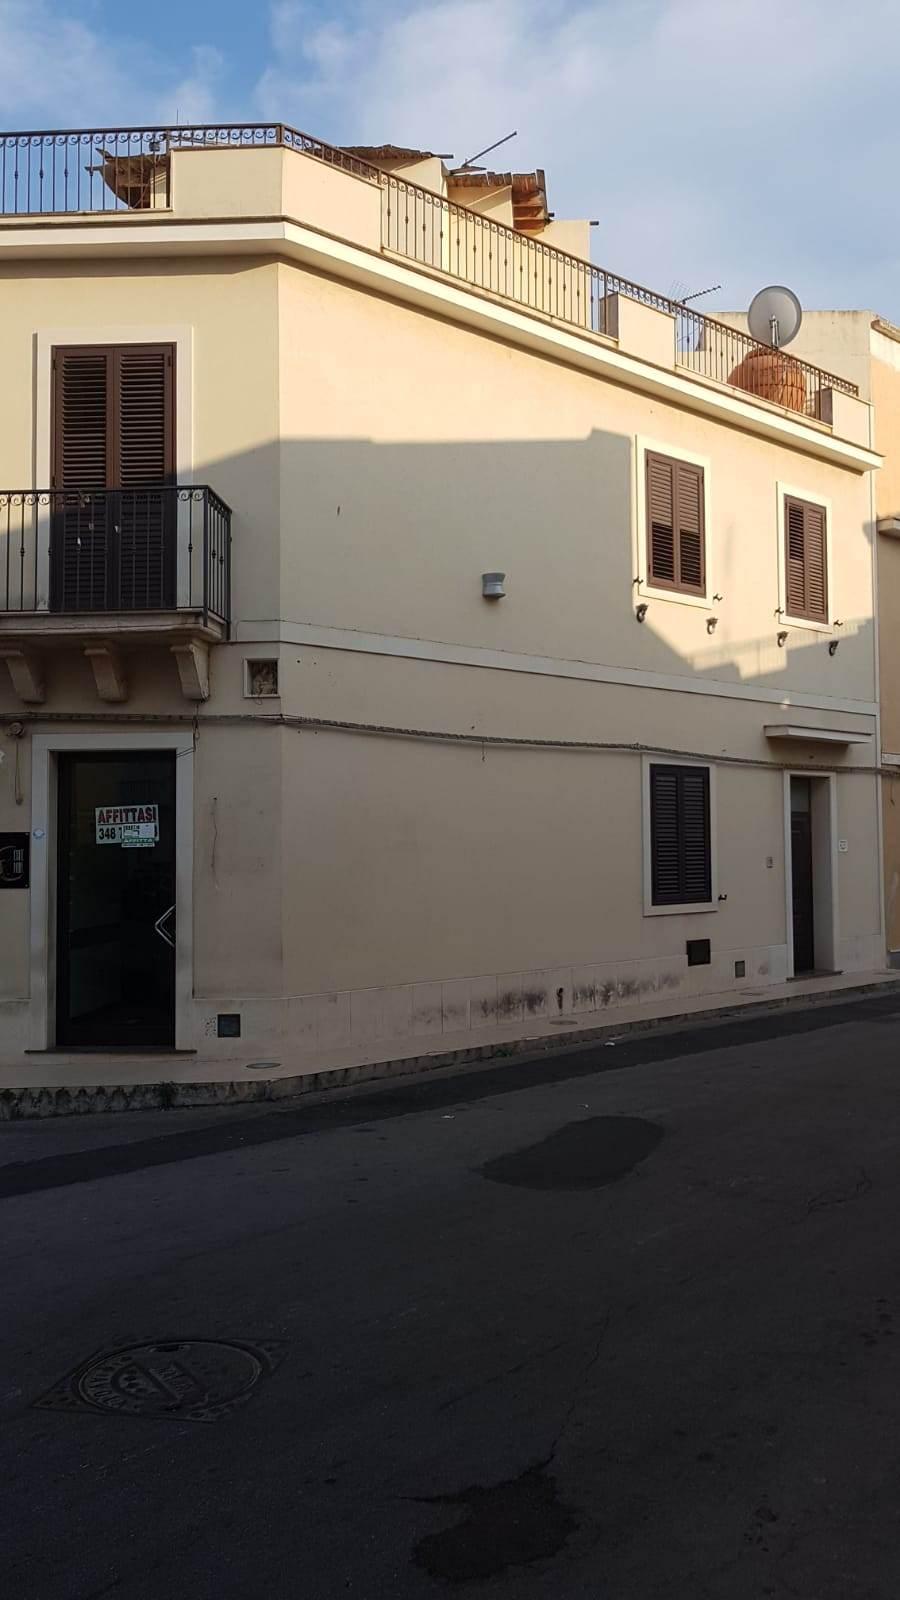 For sale Detached house Avola  #28CZ n.3